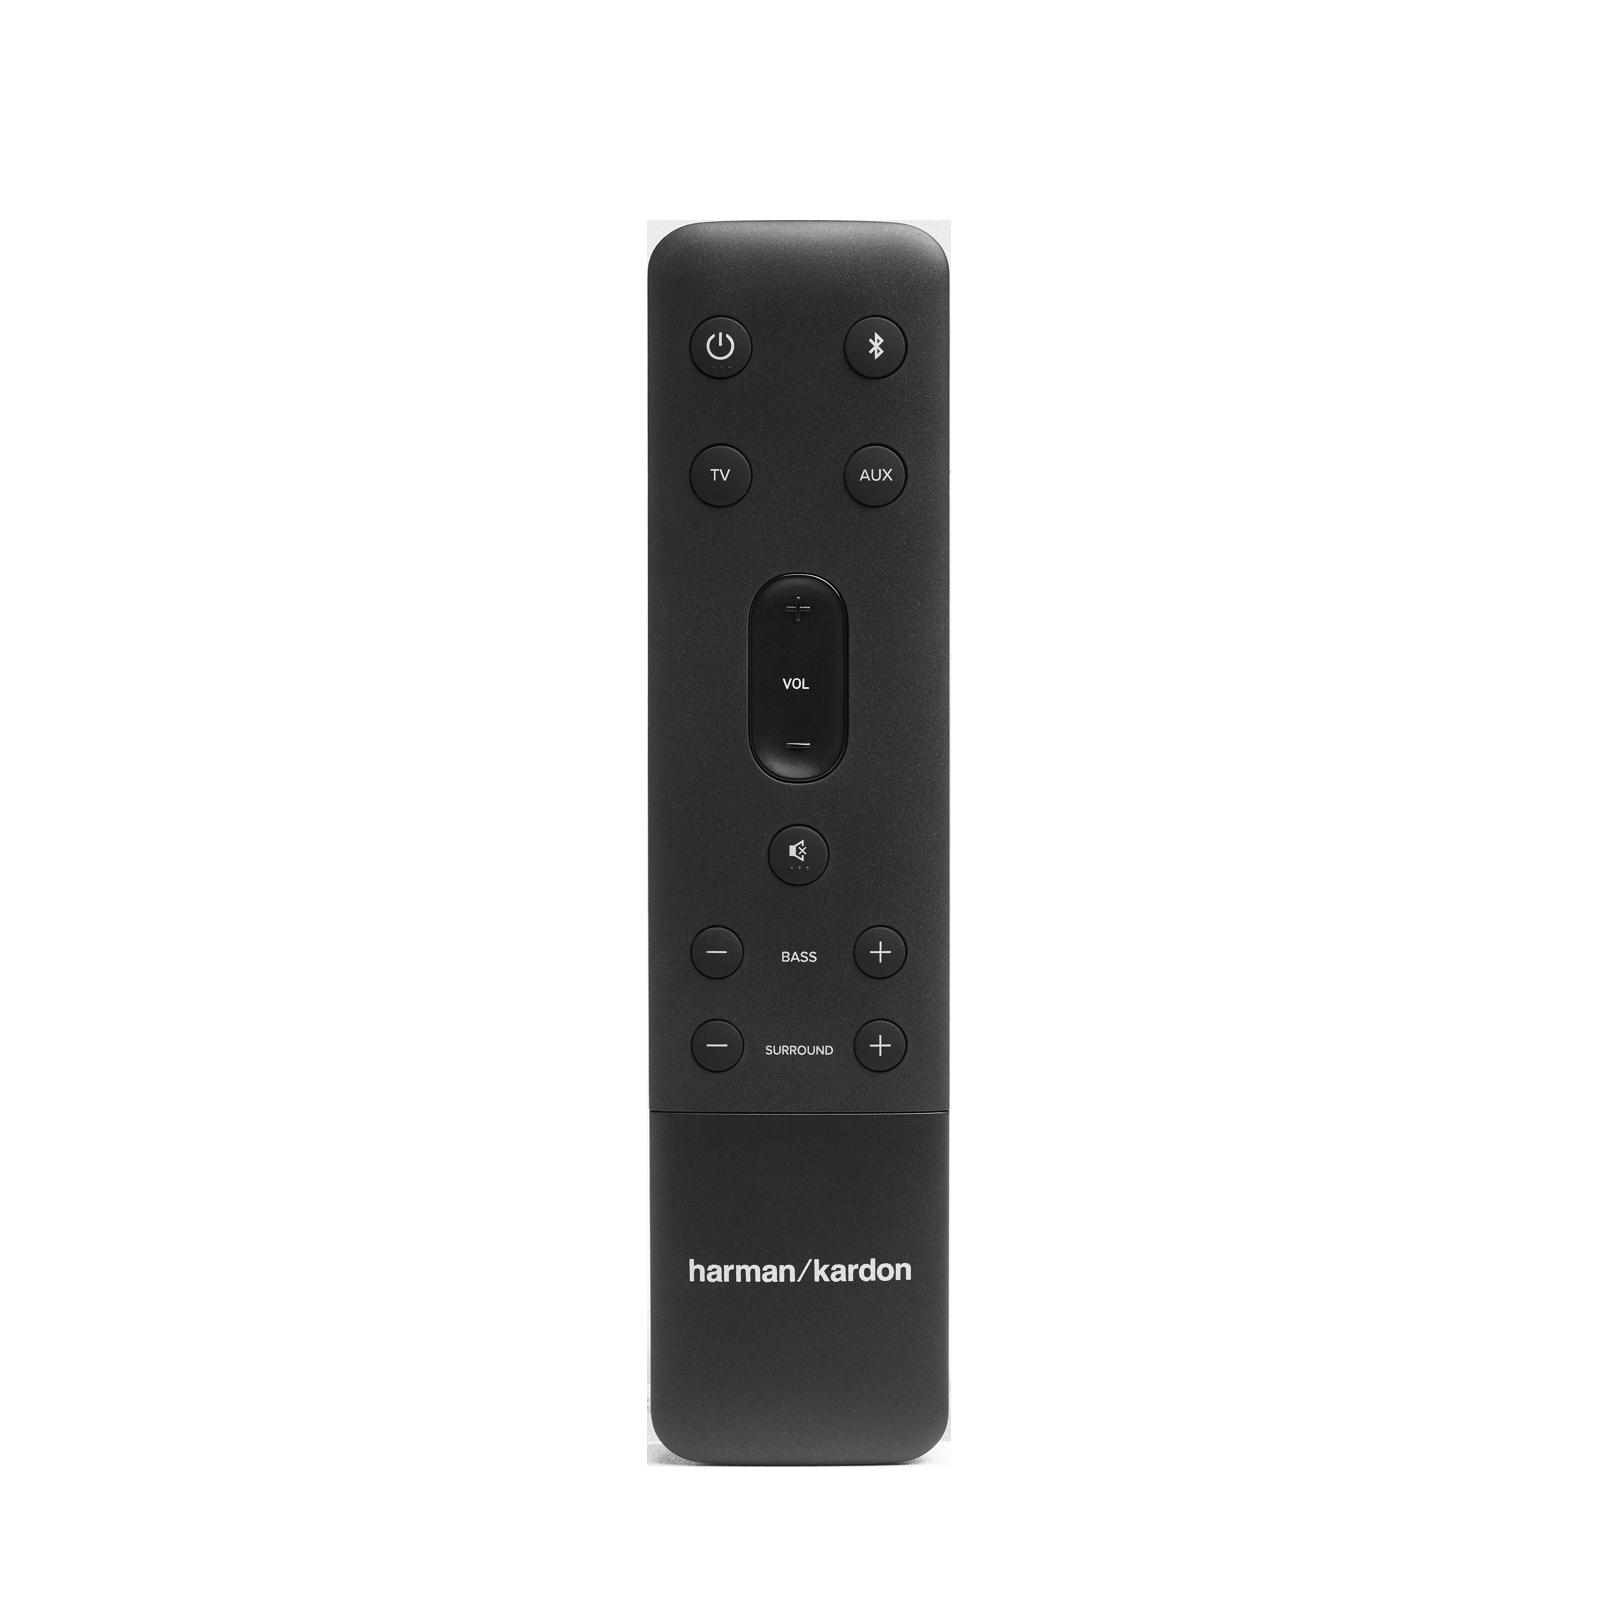 Harman Kardon Citation Amp - Black - High-power, wireless streaming stereo amplifier - Detailshot 3